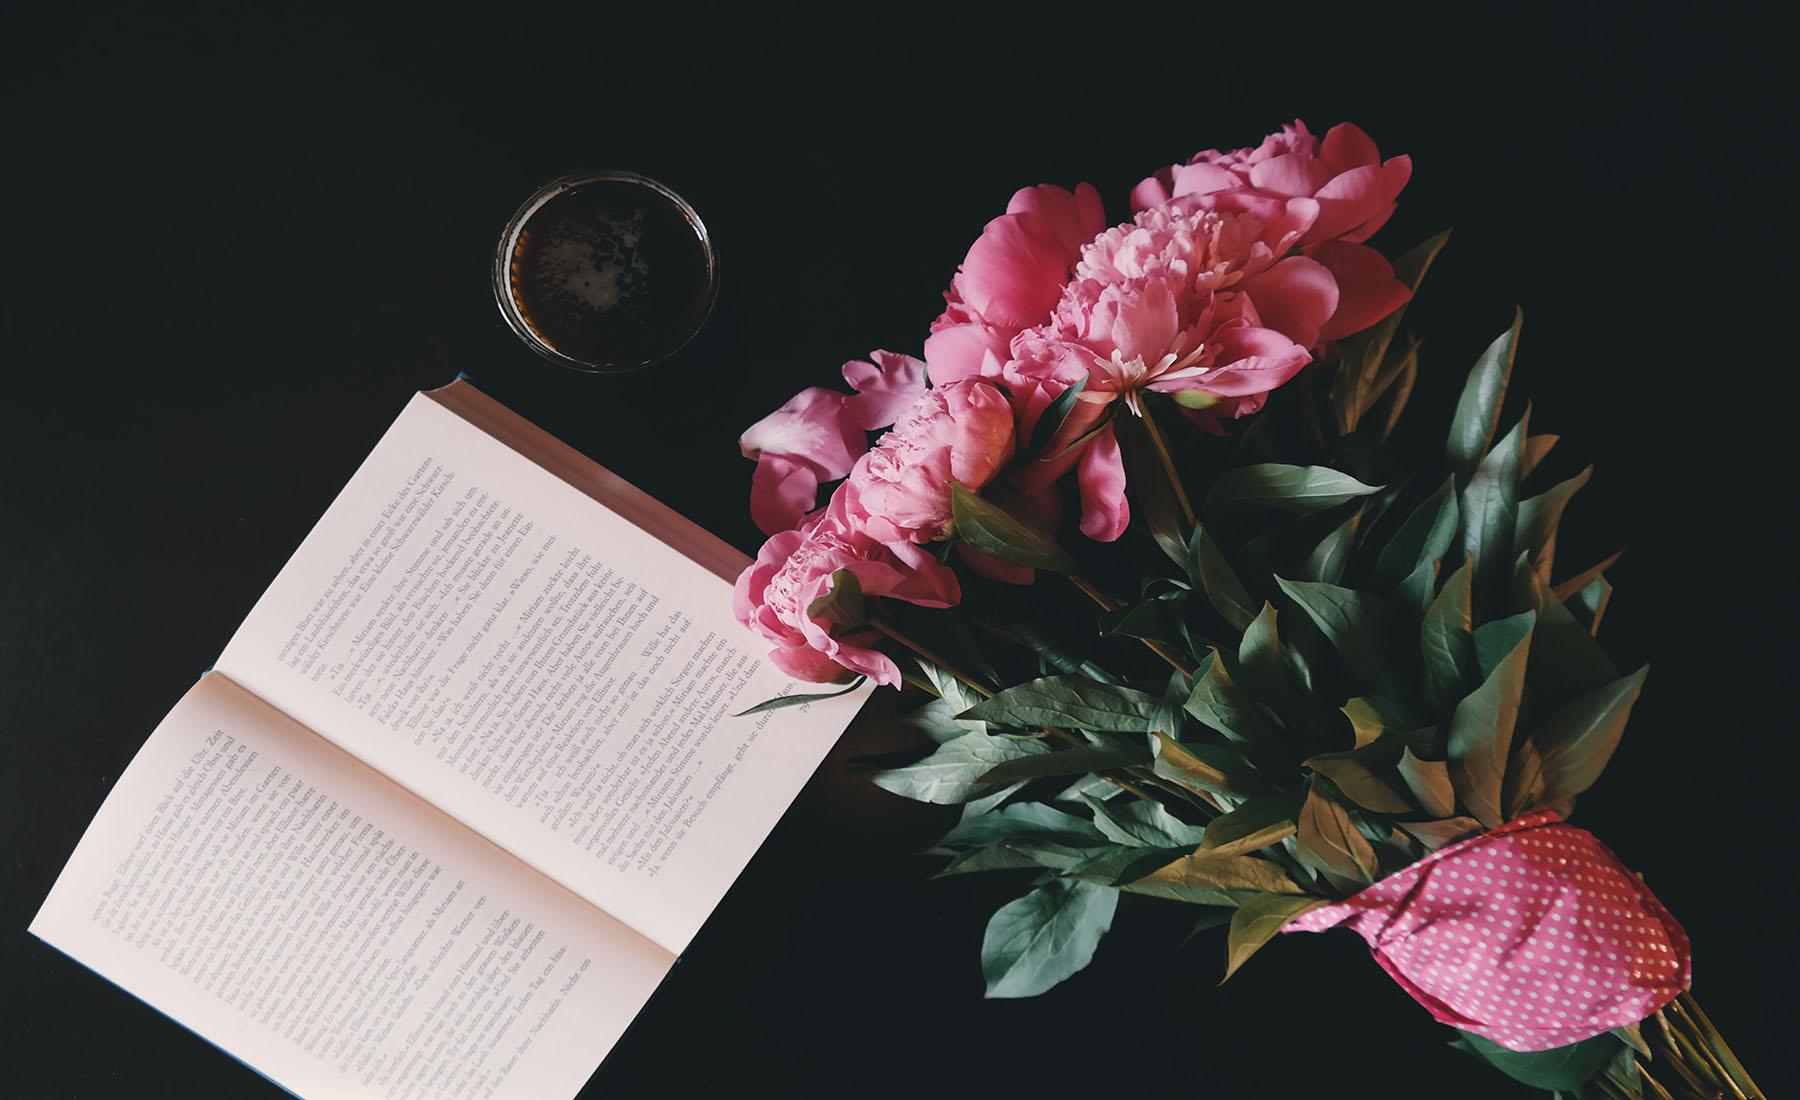 roses, flowers, book,